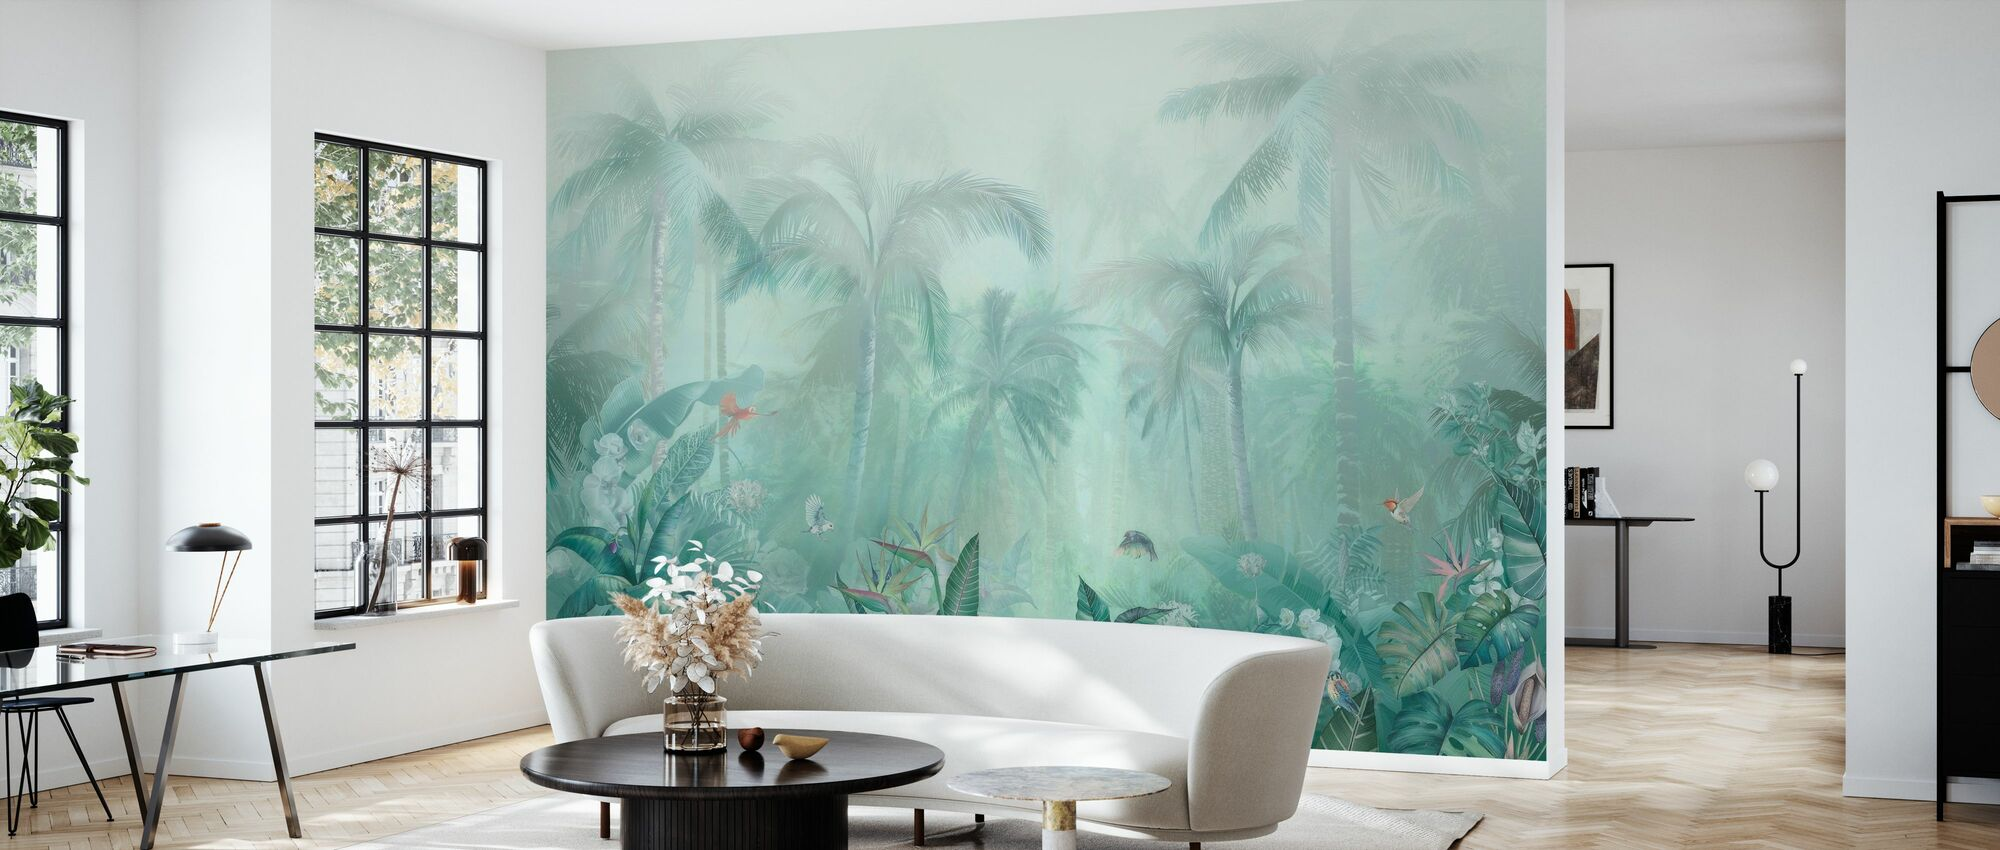 Green Forest - Wallpaper - Living Room